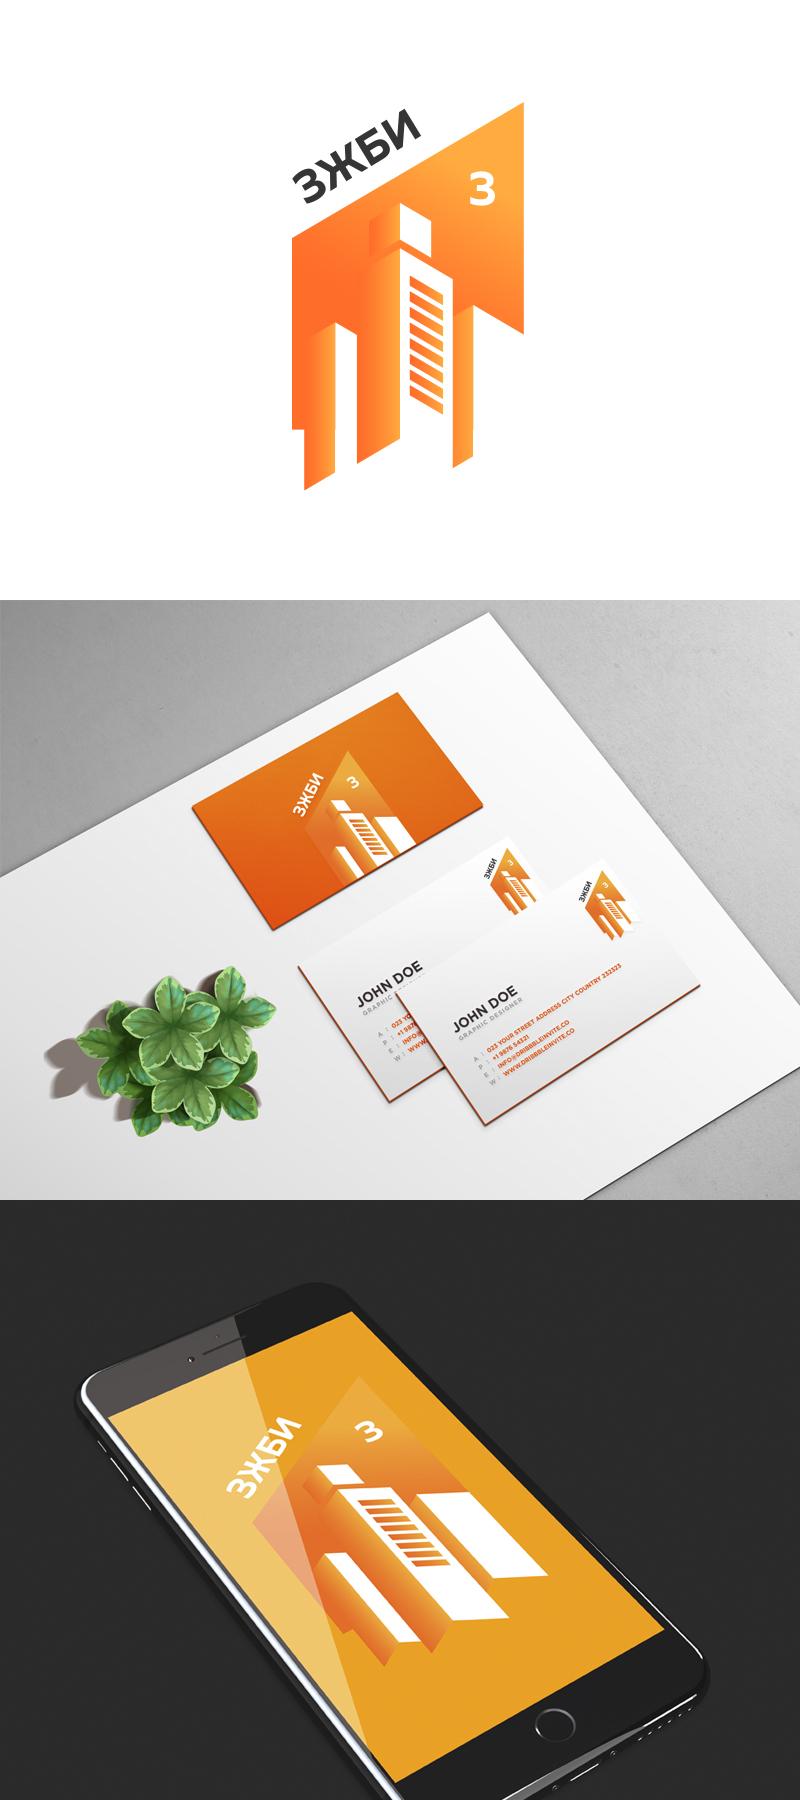 Разработка логотипа и фирменный стиль фото f_31559707d7d21cd9.jpg